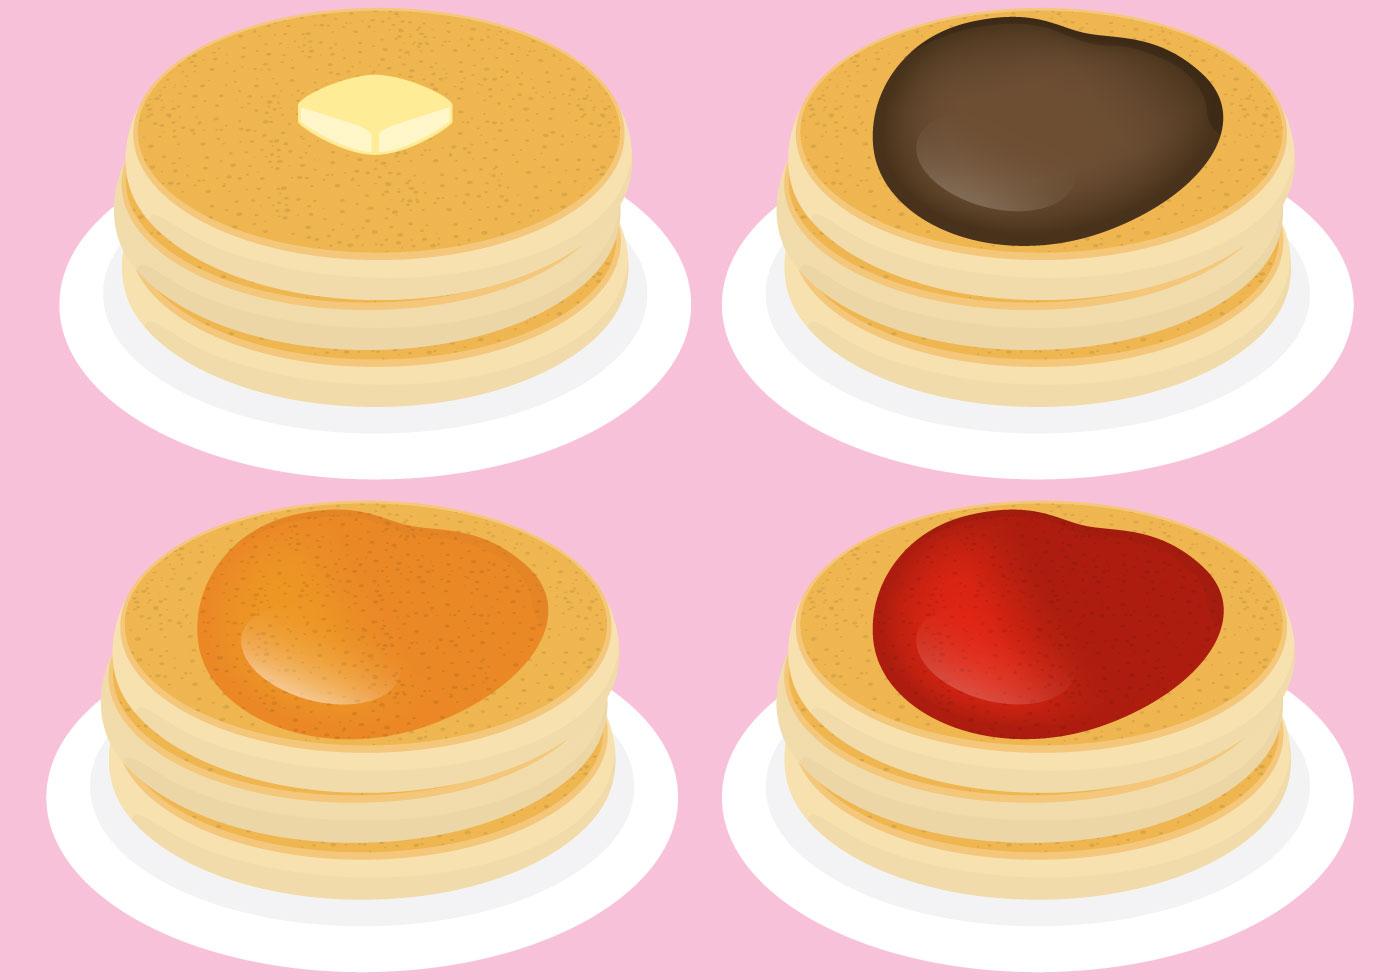 1400x980 Pancakes Free Vector Art